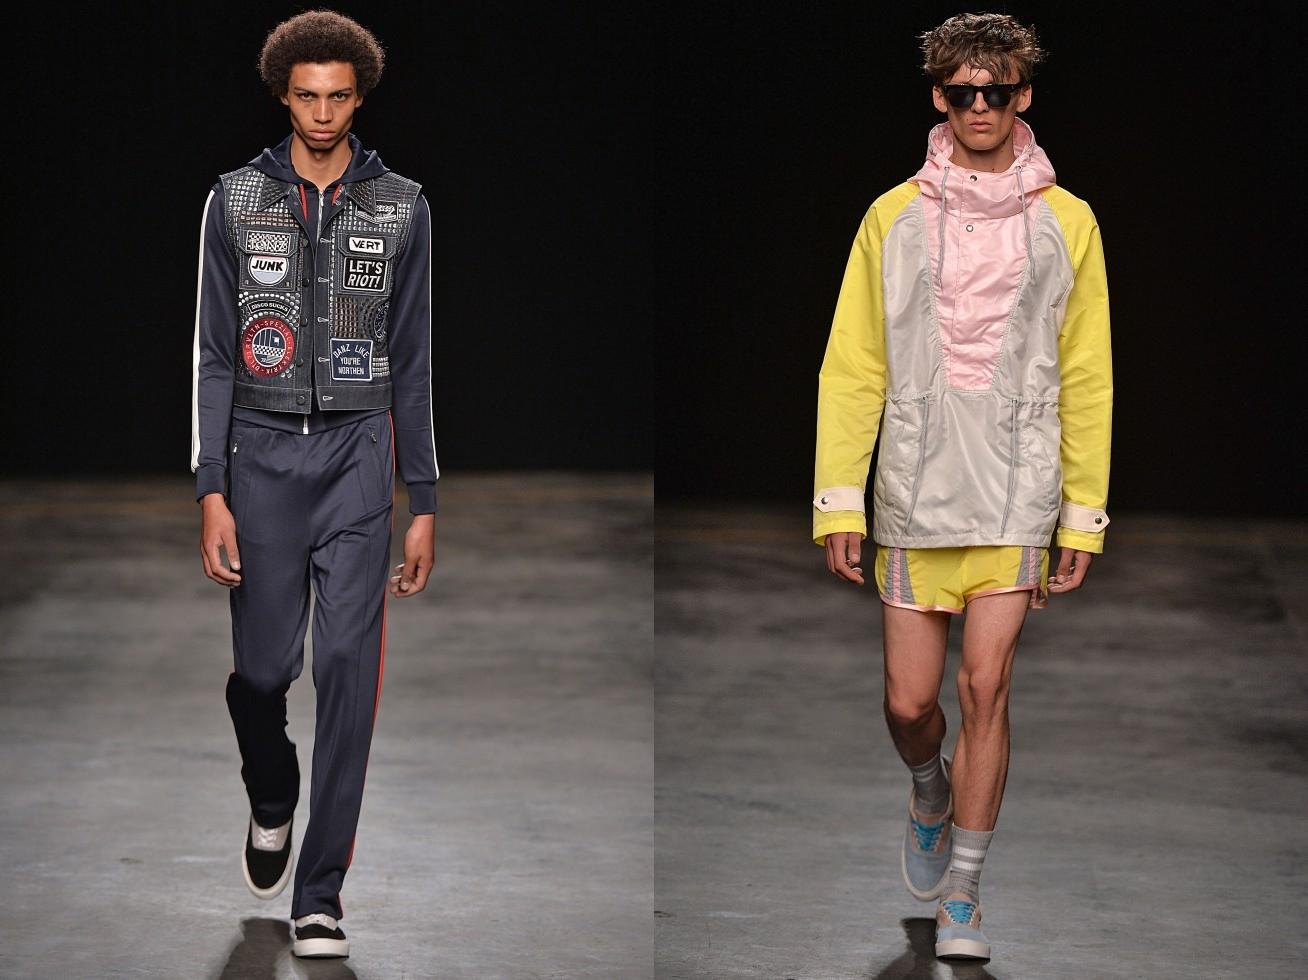 topman-desfile-primavera-verao-2016-londres, moda masculina, tendencia masculina, menswear, style, trends, alex cursino, blog de moda masculina,